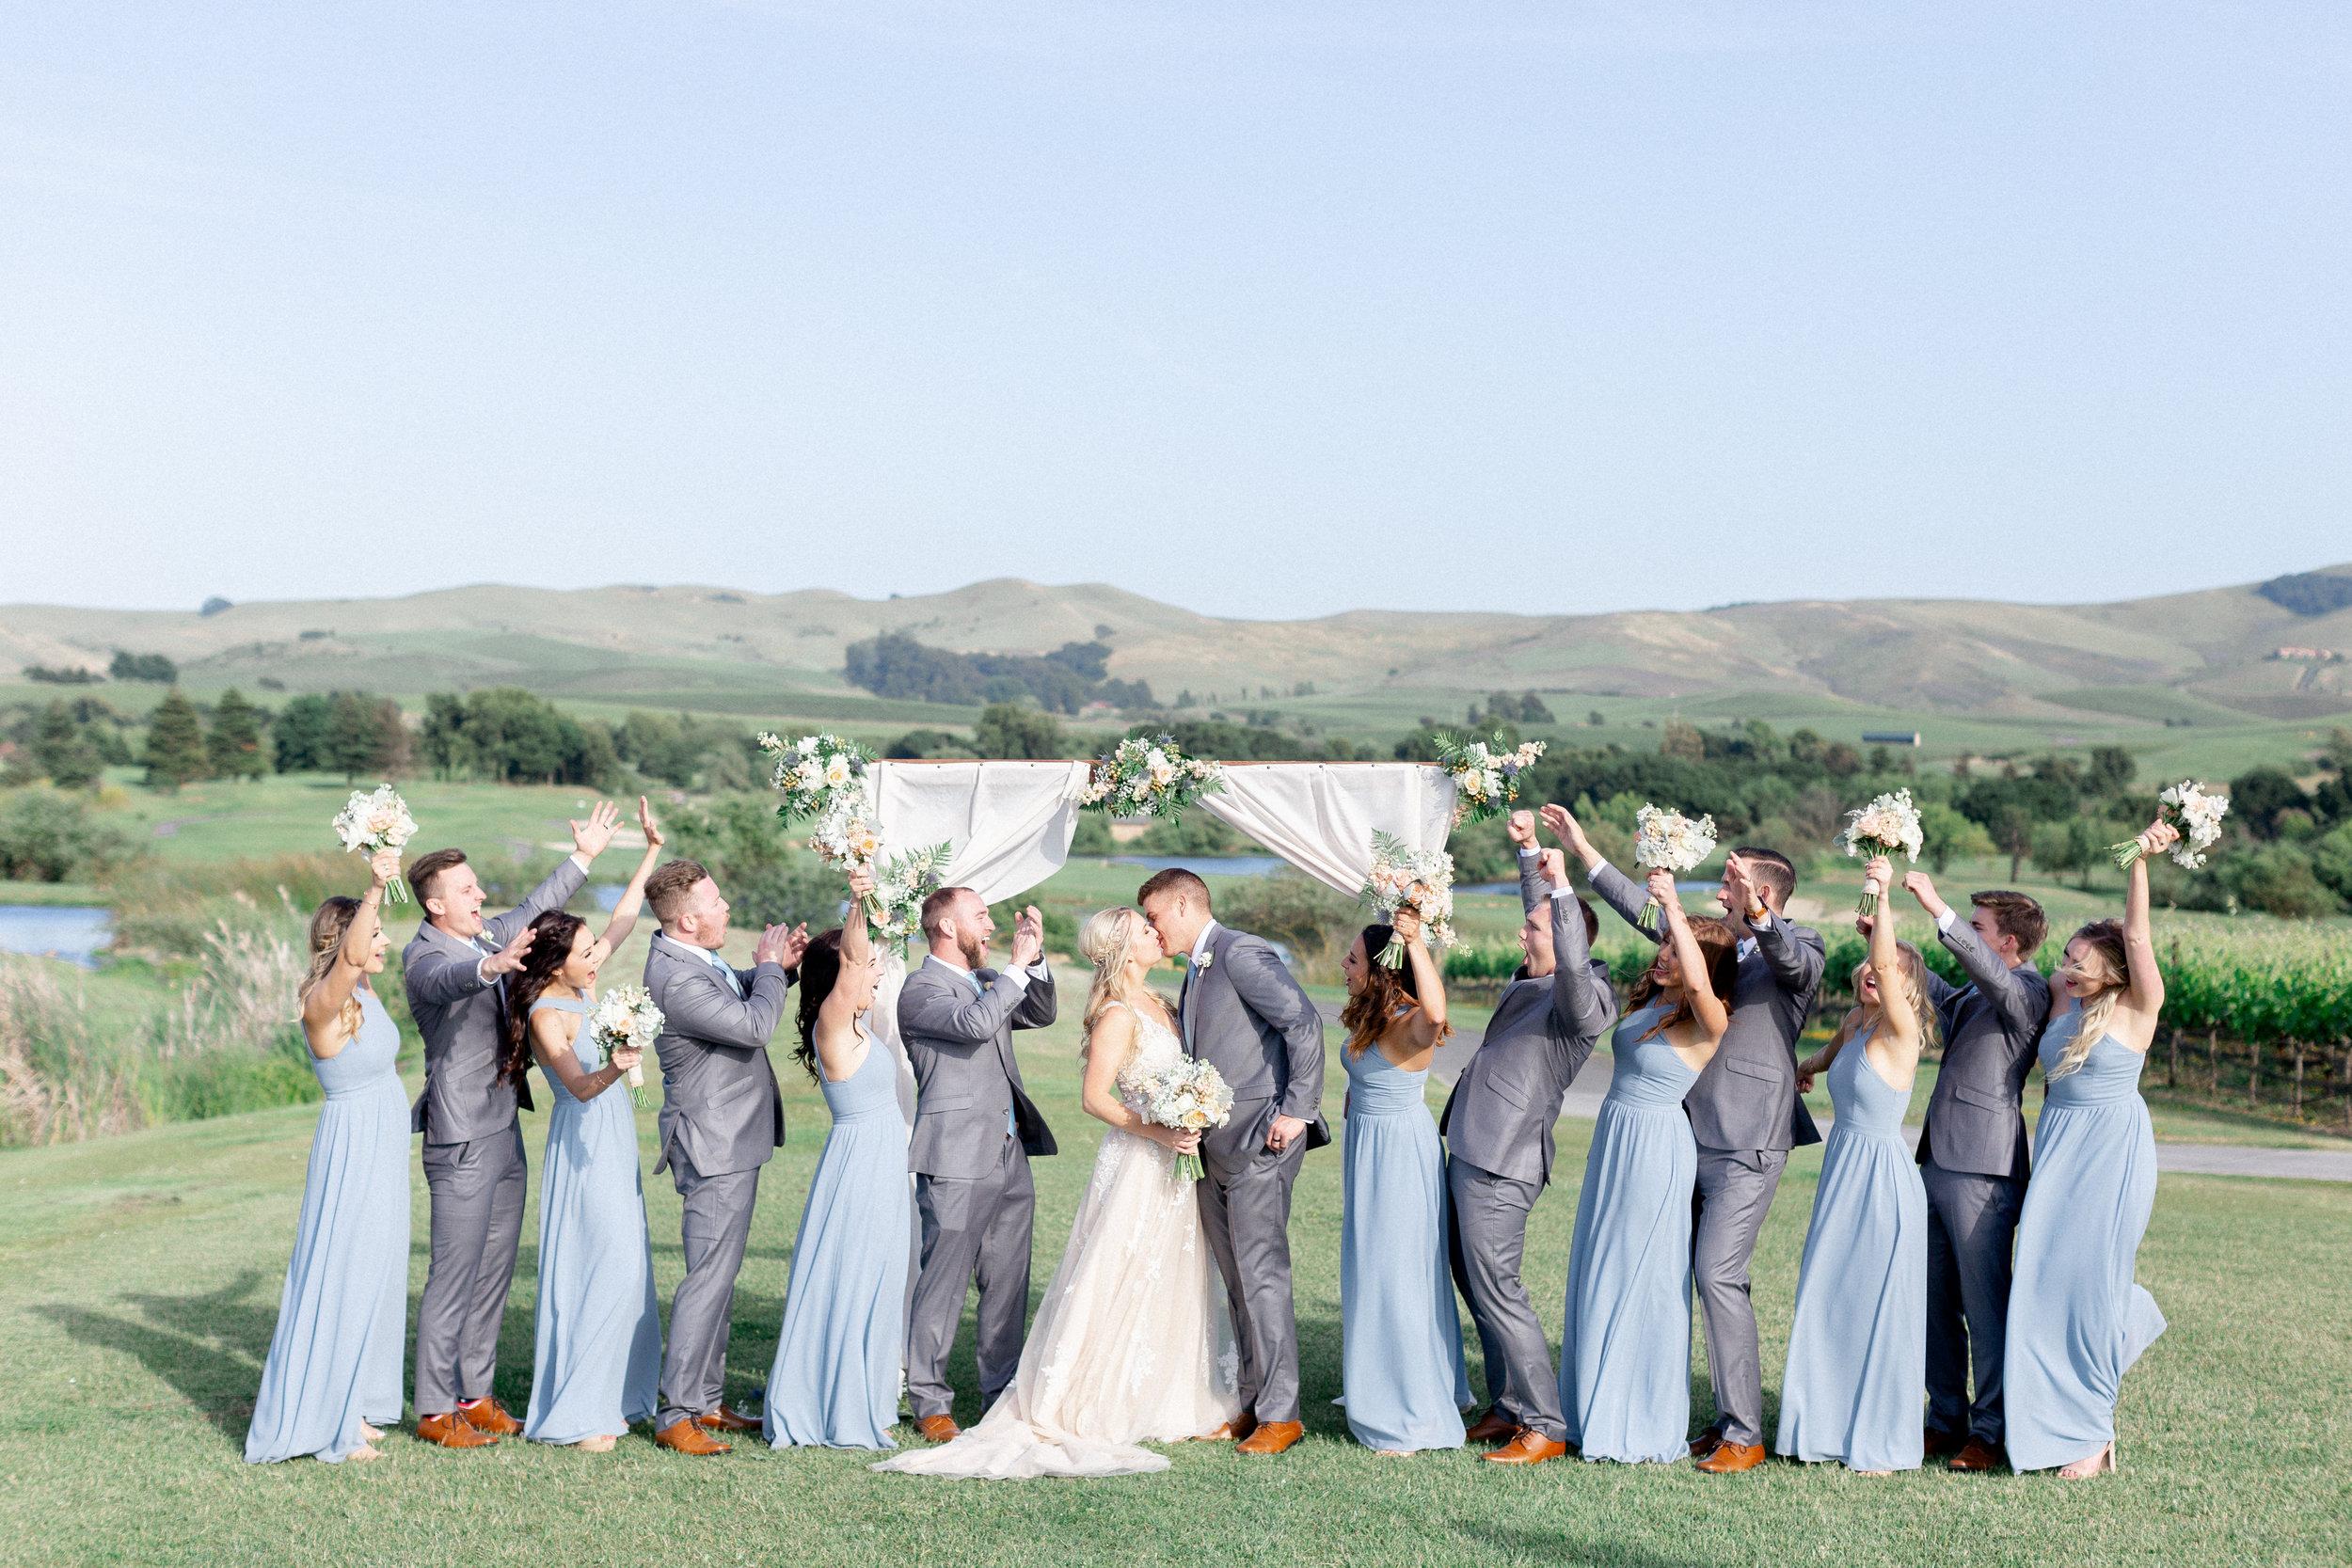 Eagle-Vines-Golf-Course-wedding-photographer (125 of 206).jpg